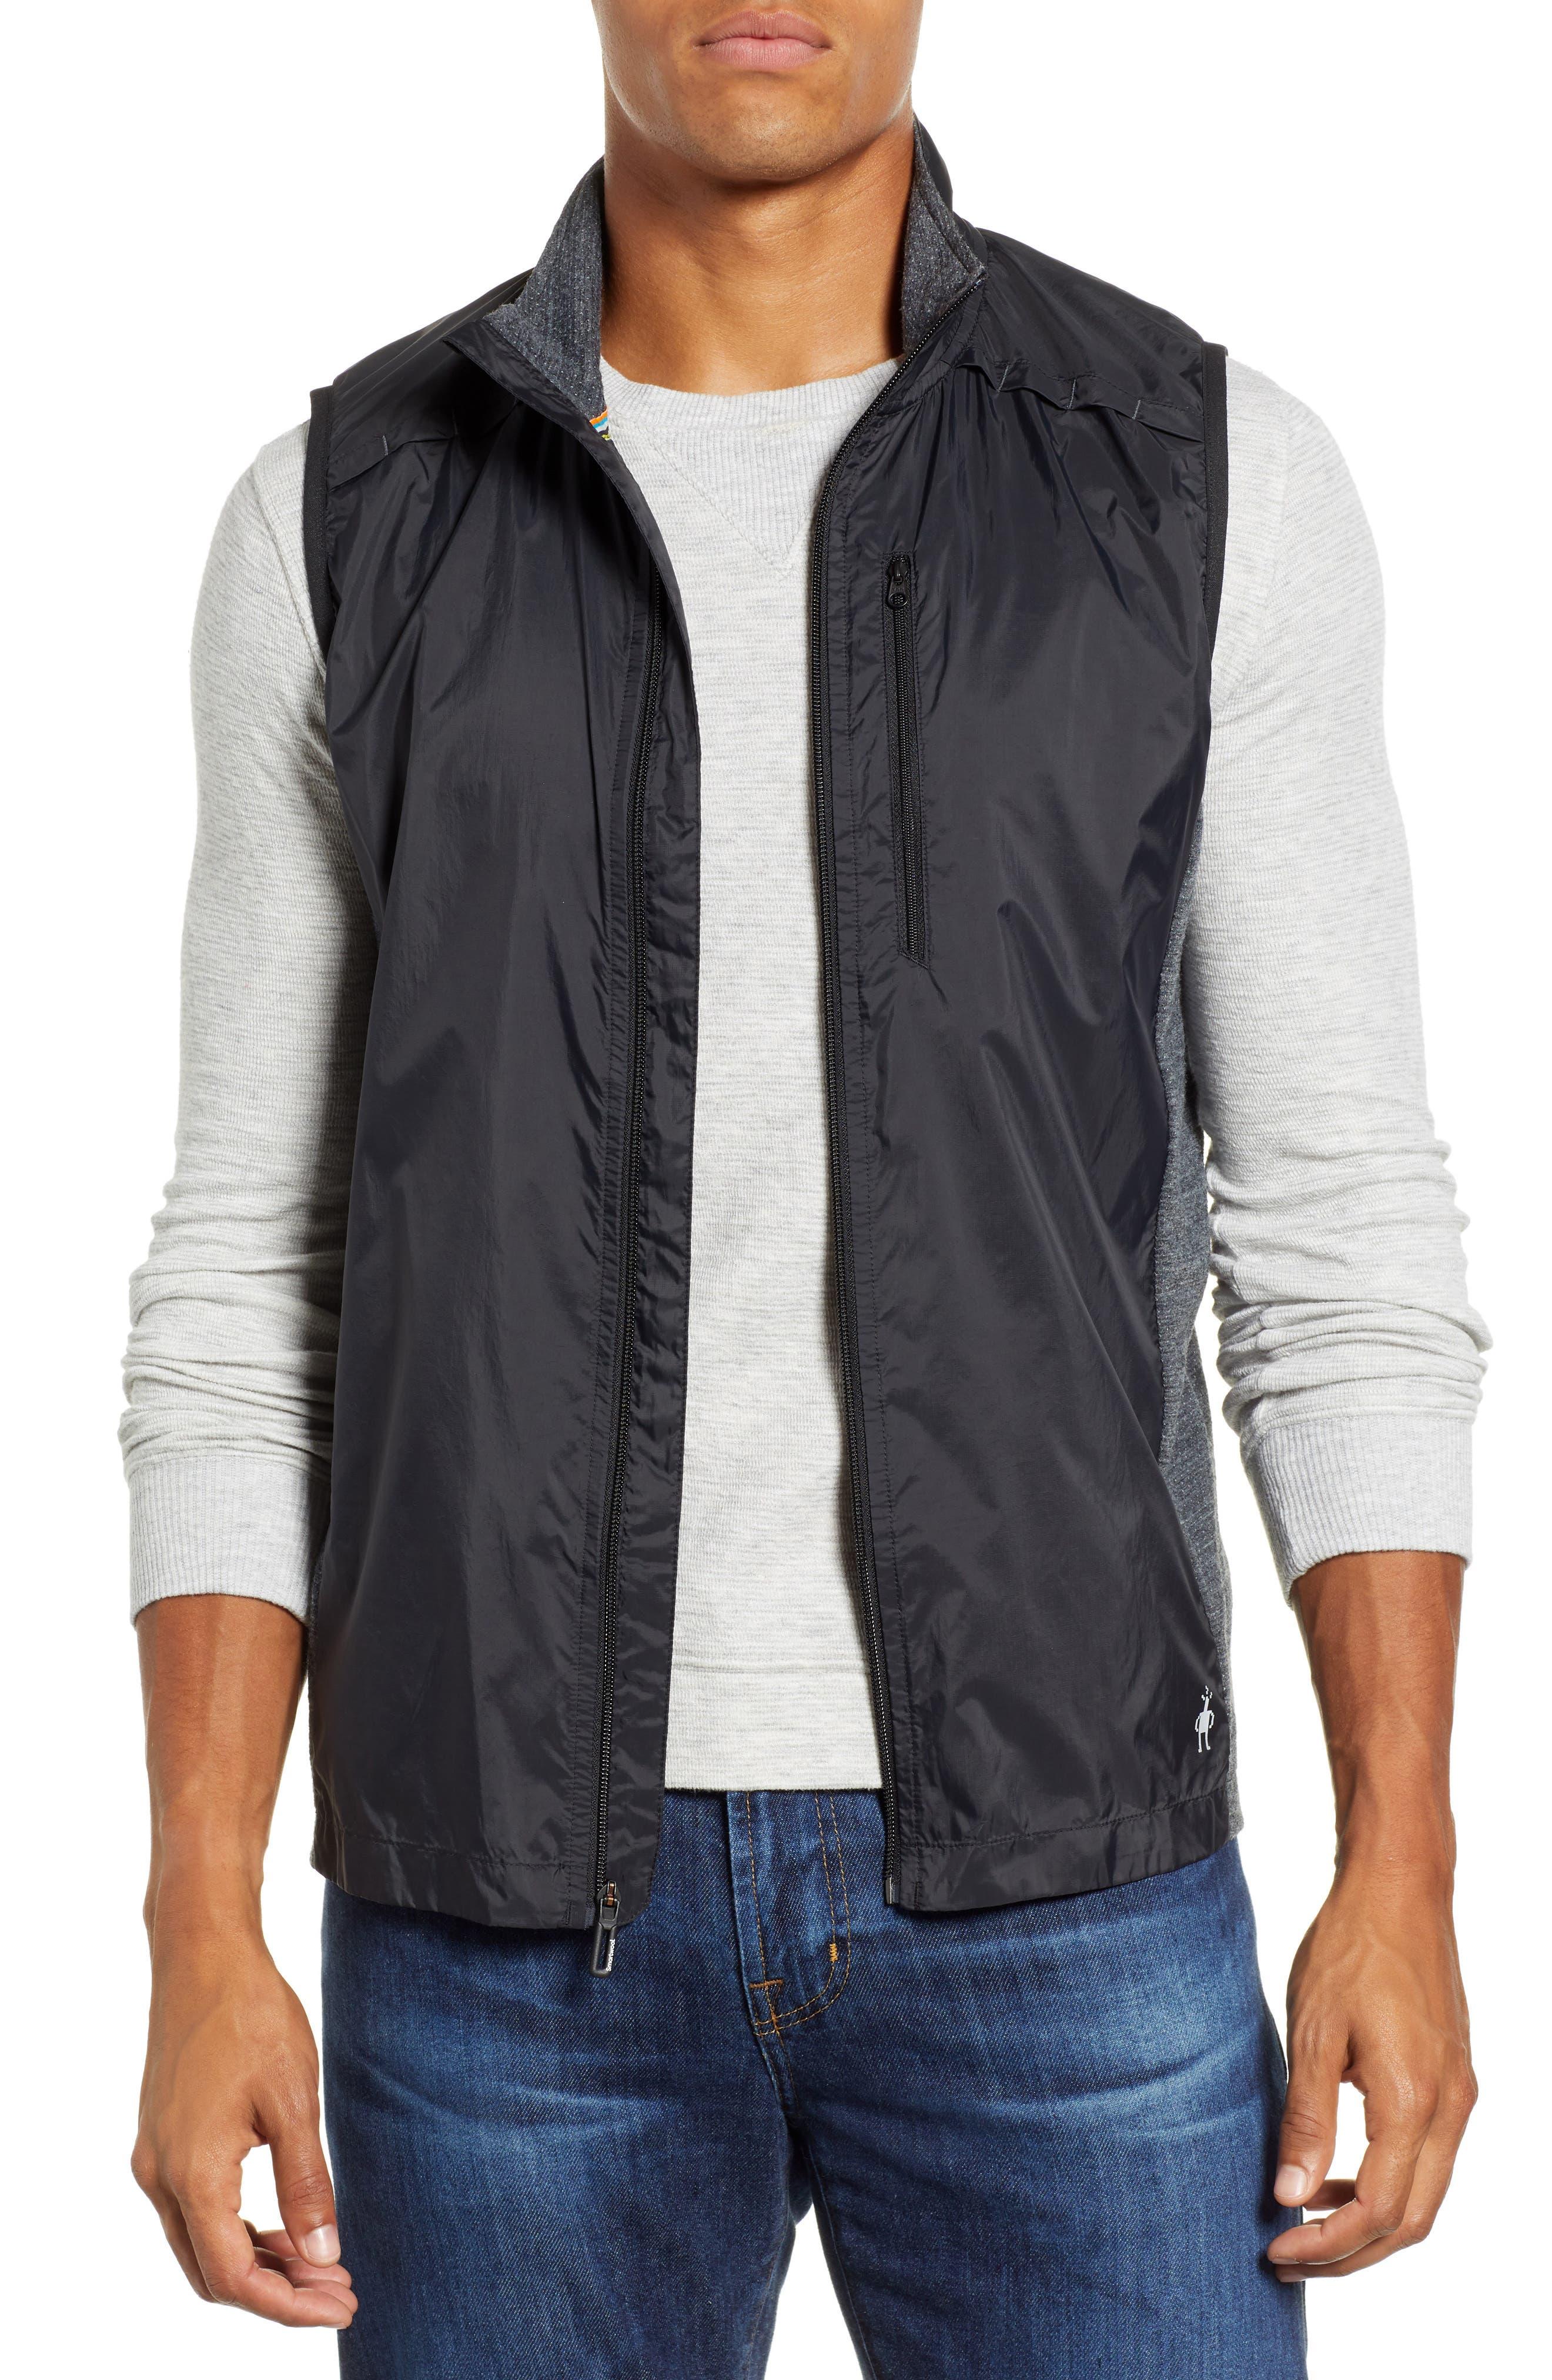 PhD<sup>®</sup> Ultra Light Sport Vest,                             Main thumbnail 1, color,                             BLACK